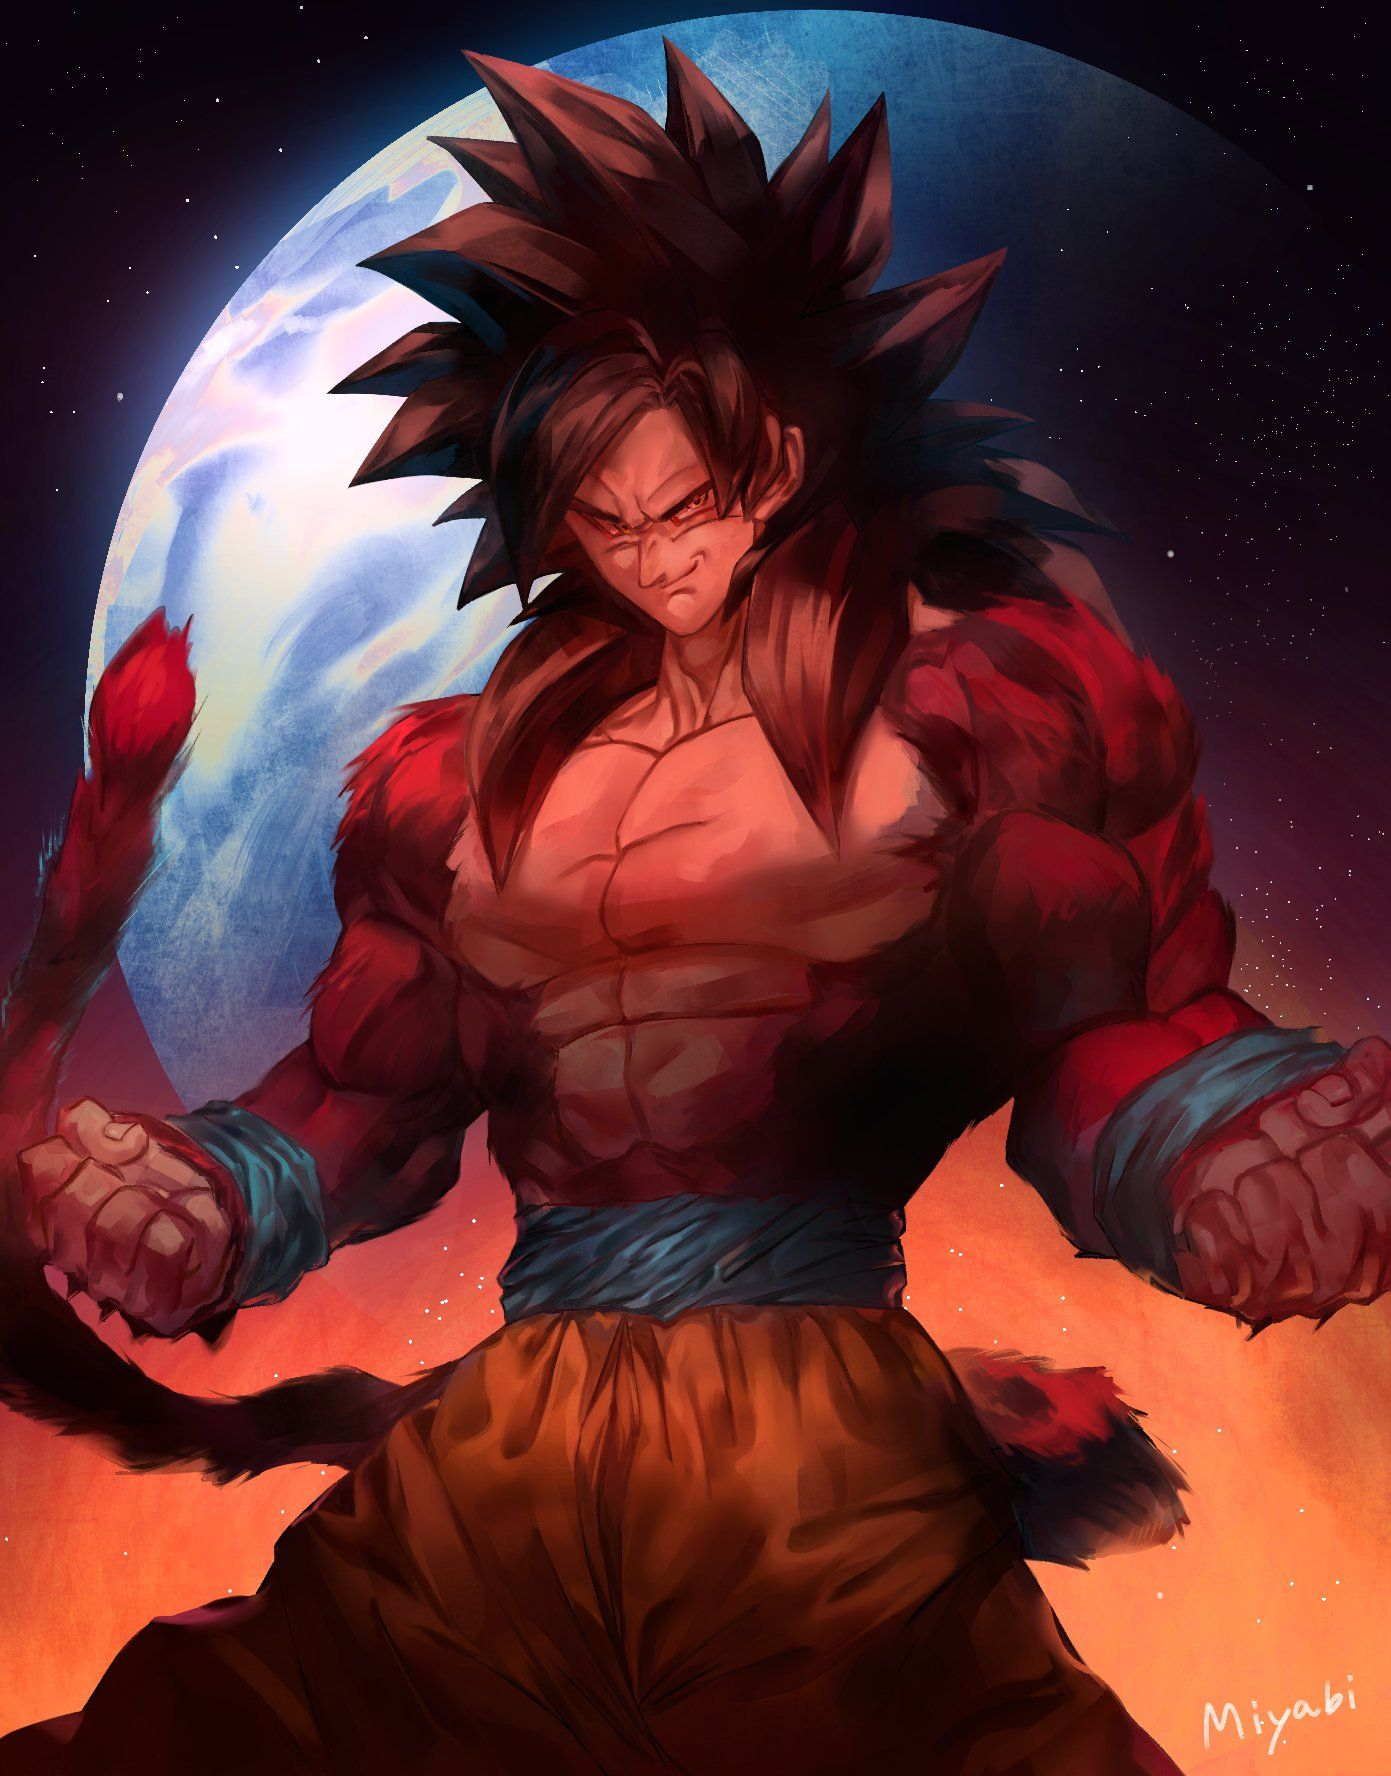 Goku Super Saiyajin 4 Anime Goku Desenho Super Sayajin